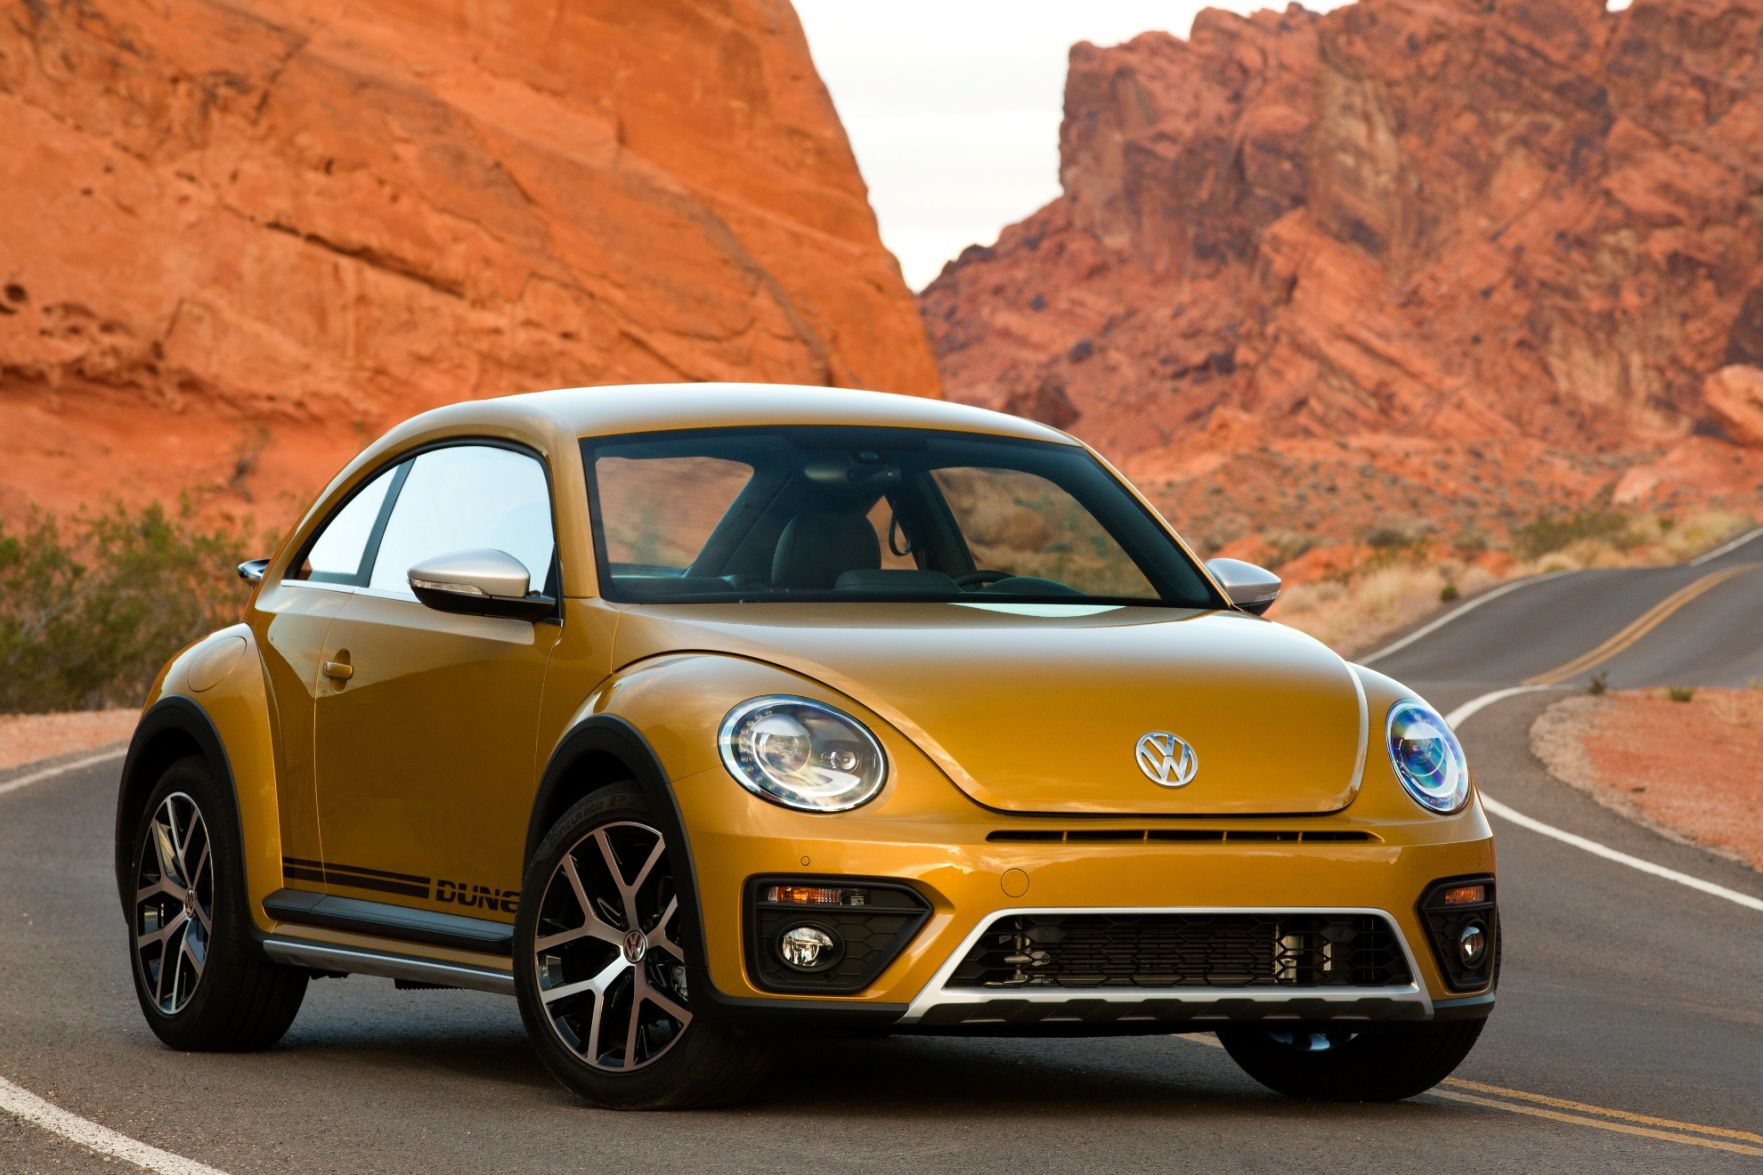 2018 Vw Beetle Dune Automotive Stltoday Com